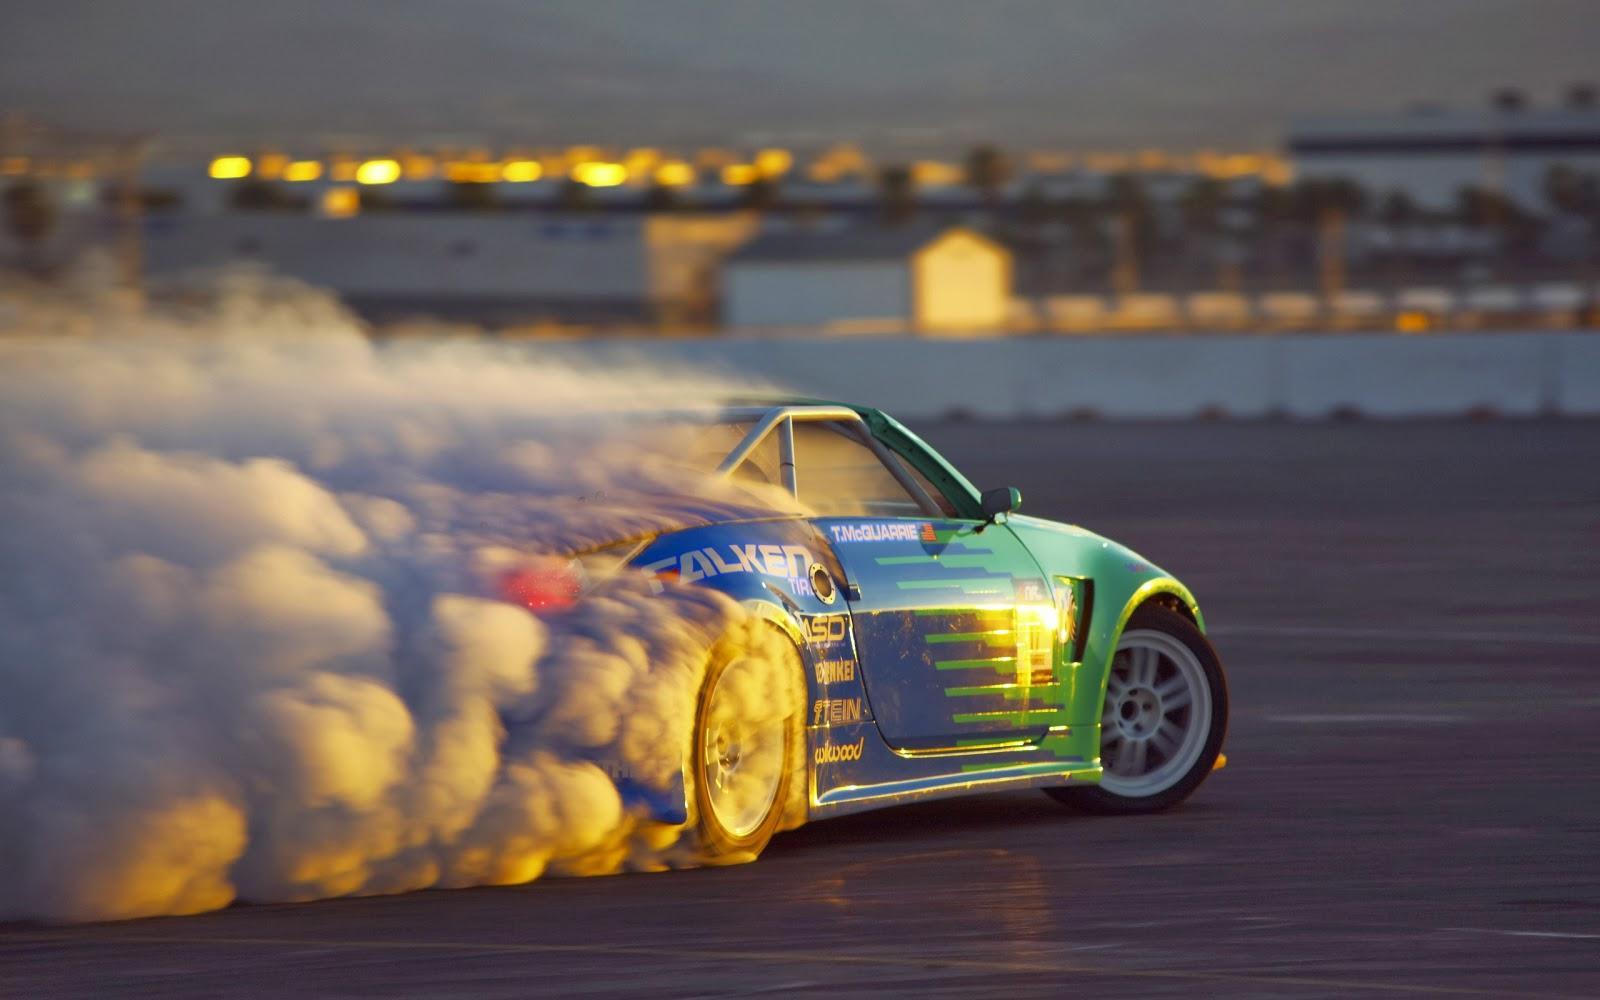 http://2.bp.blogspot.com/-buVzzDQTvJc/UxZOYXqyLSI/AAAAAAAAYnU/E_k-wHUl6Rc/s1600/car-drift-sunset-burnout.jpg